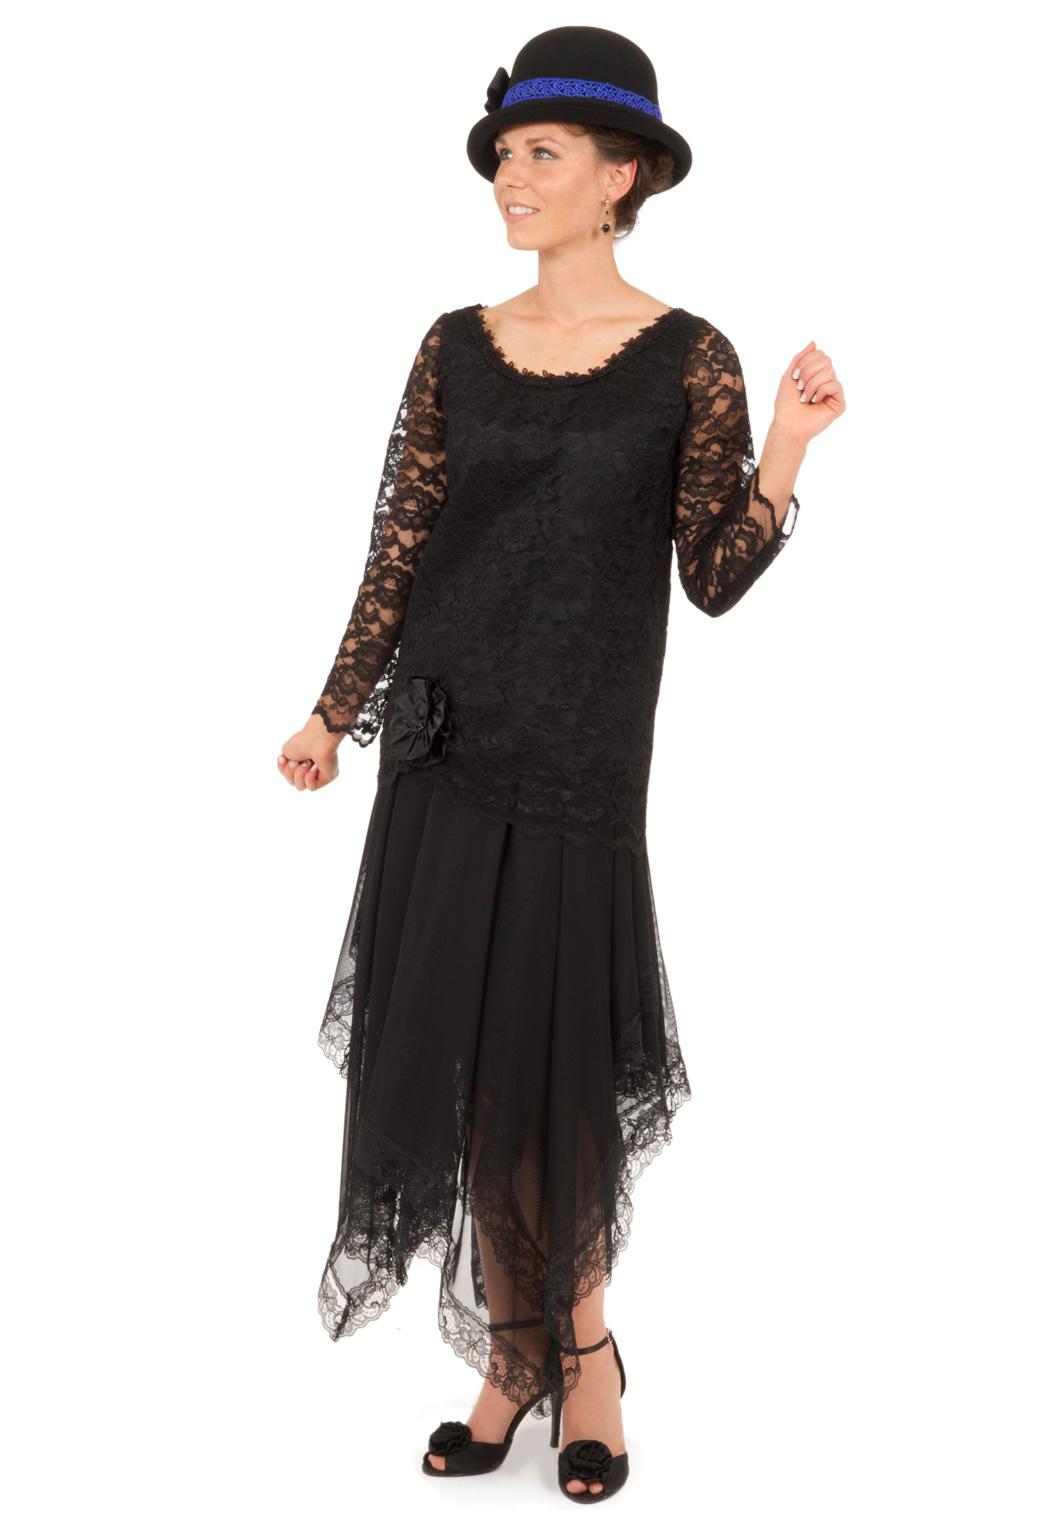 roaring 20's dresses to buy – fashion dresses